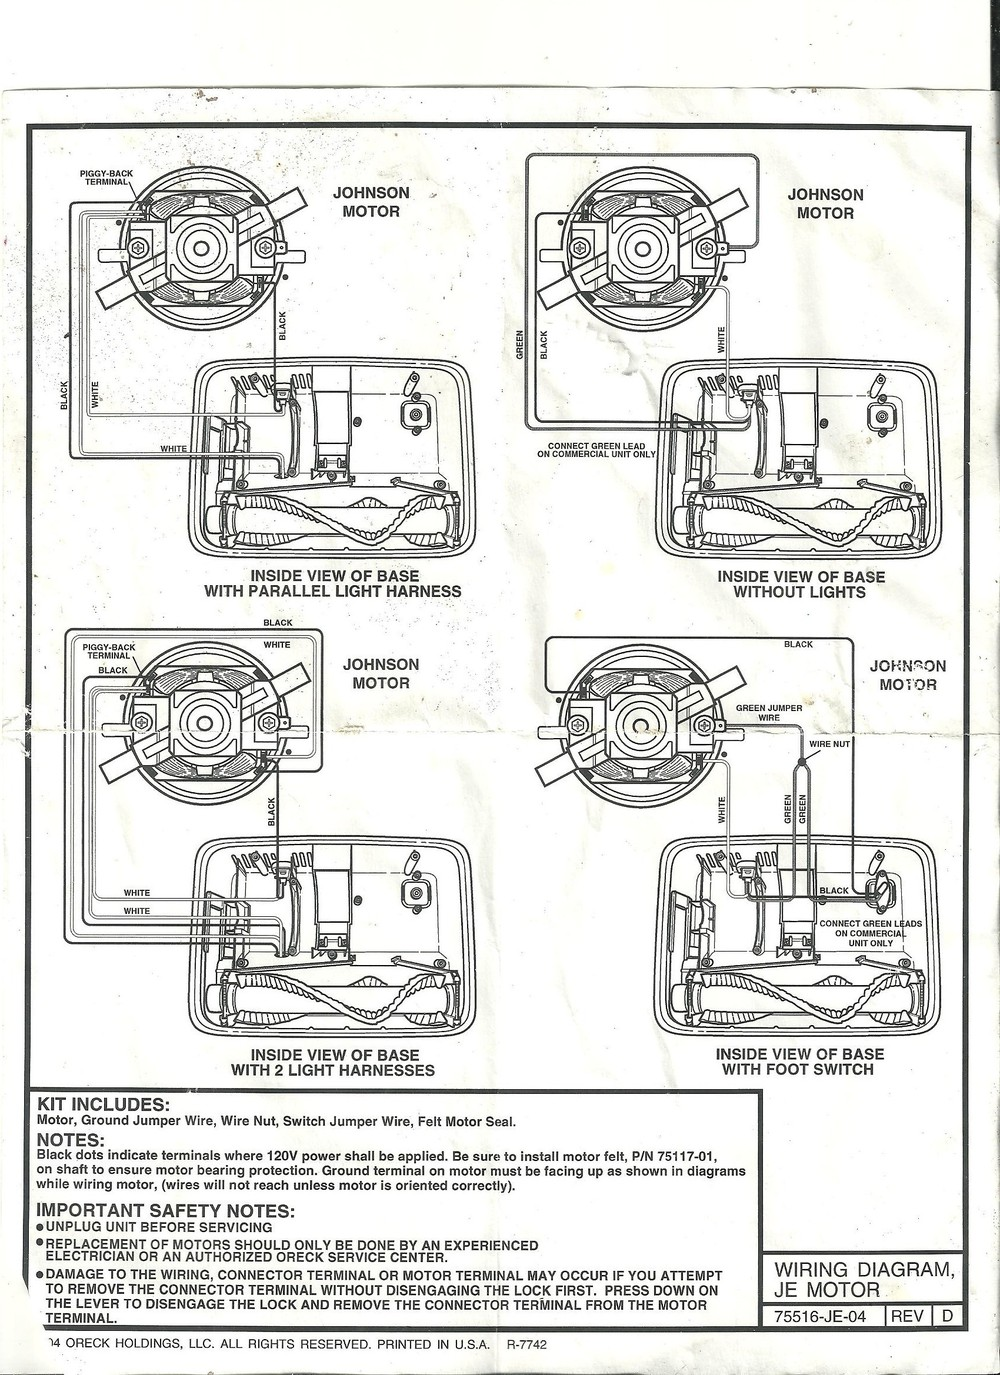 HELP ME!!! oreck xl2 motor wireing